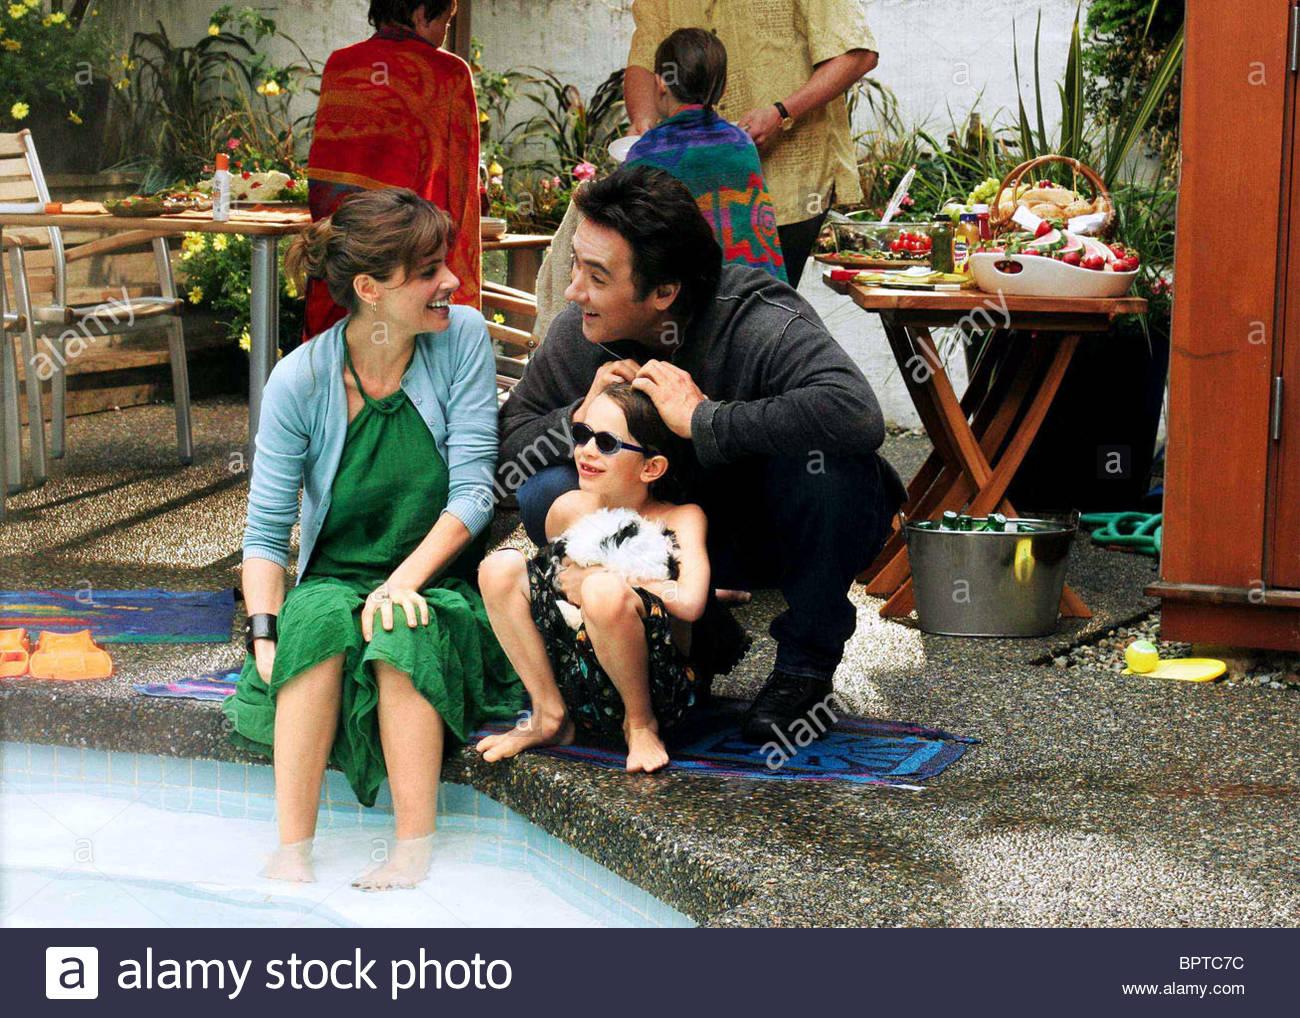 AMANDA PEET JOHN CUSACK & BOBBY COLEMAN THE MARTIAN CHILD (2007) Stock Photo